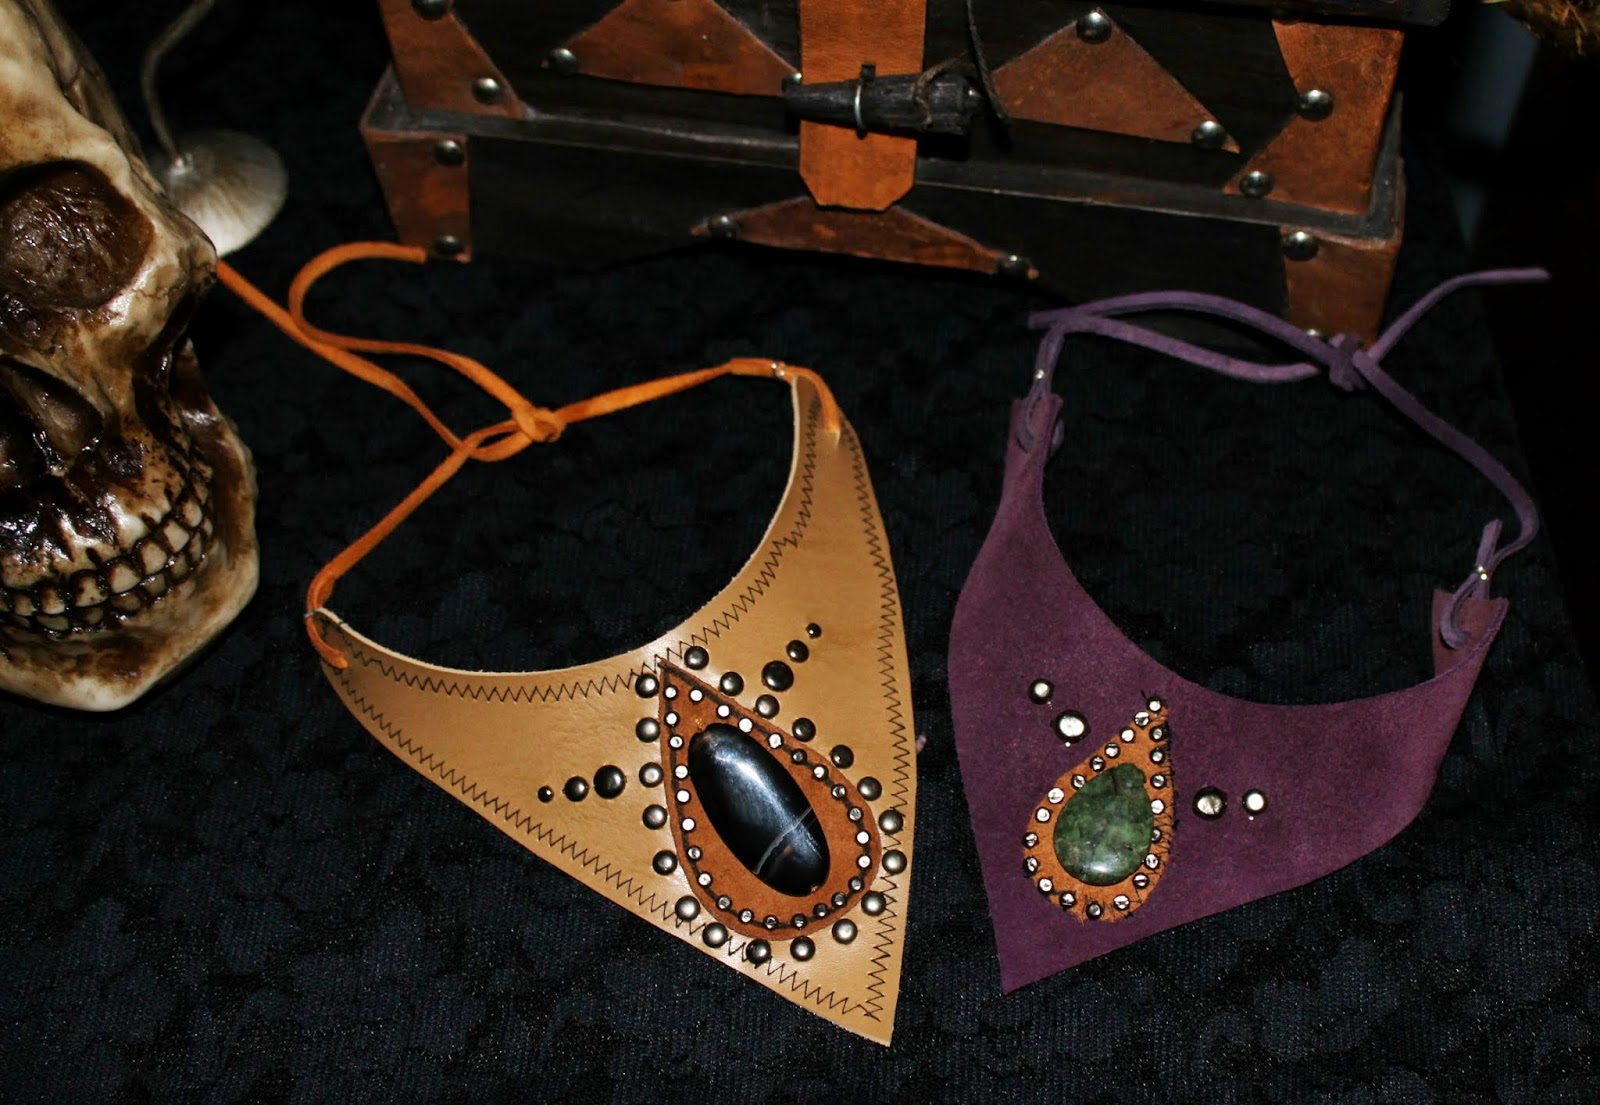 Artesanato Em Mdf Kit Higiene Para Bebe ~ Santta Tend u00eancia DIY Colar Artesanal Com Pedras